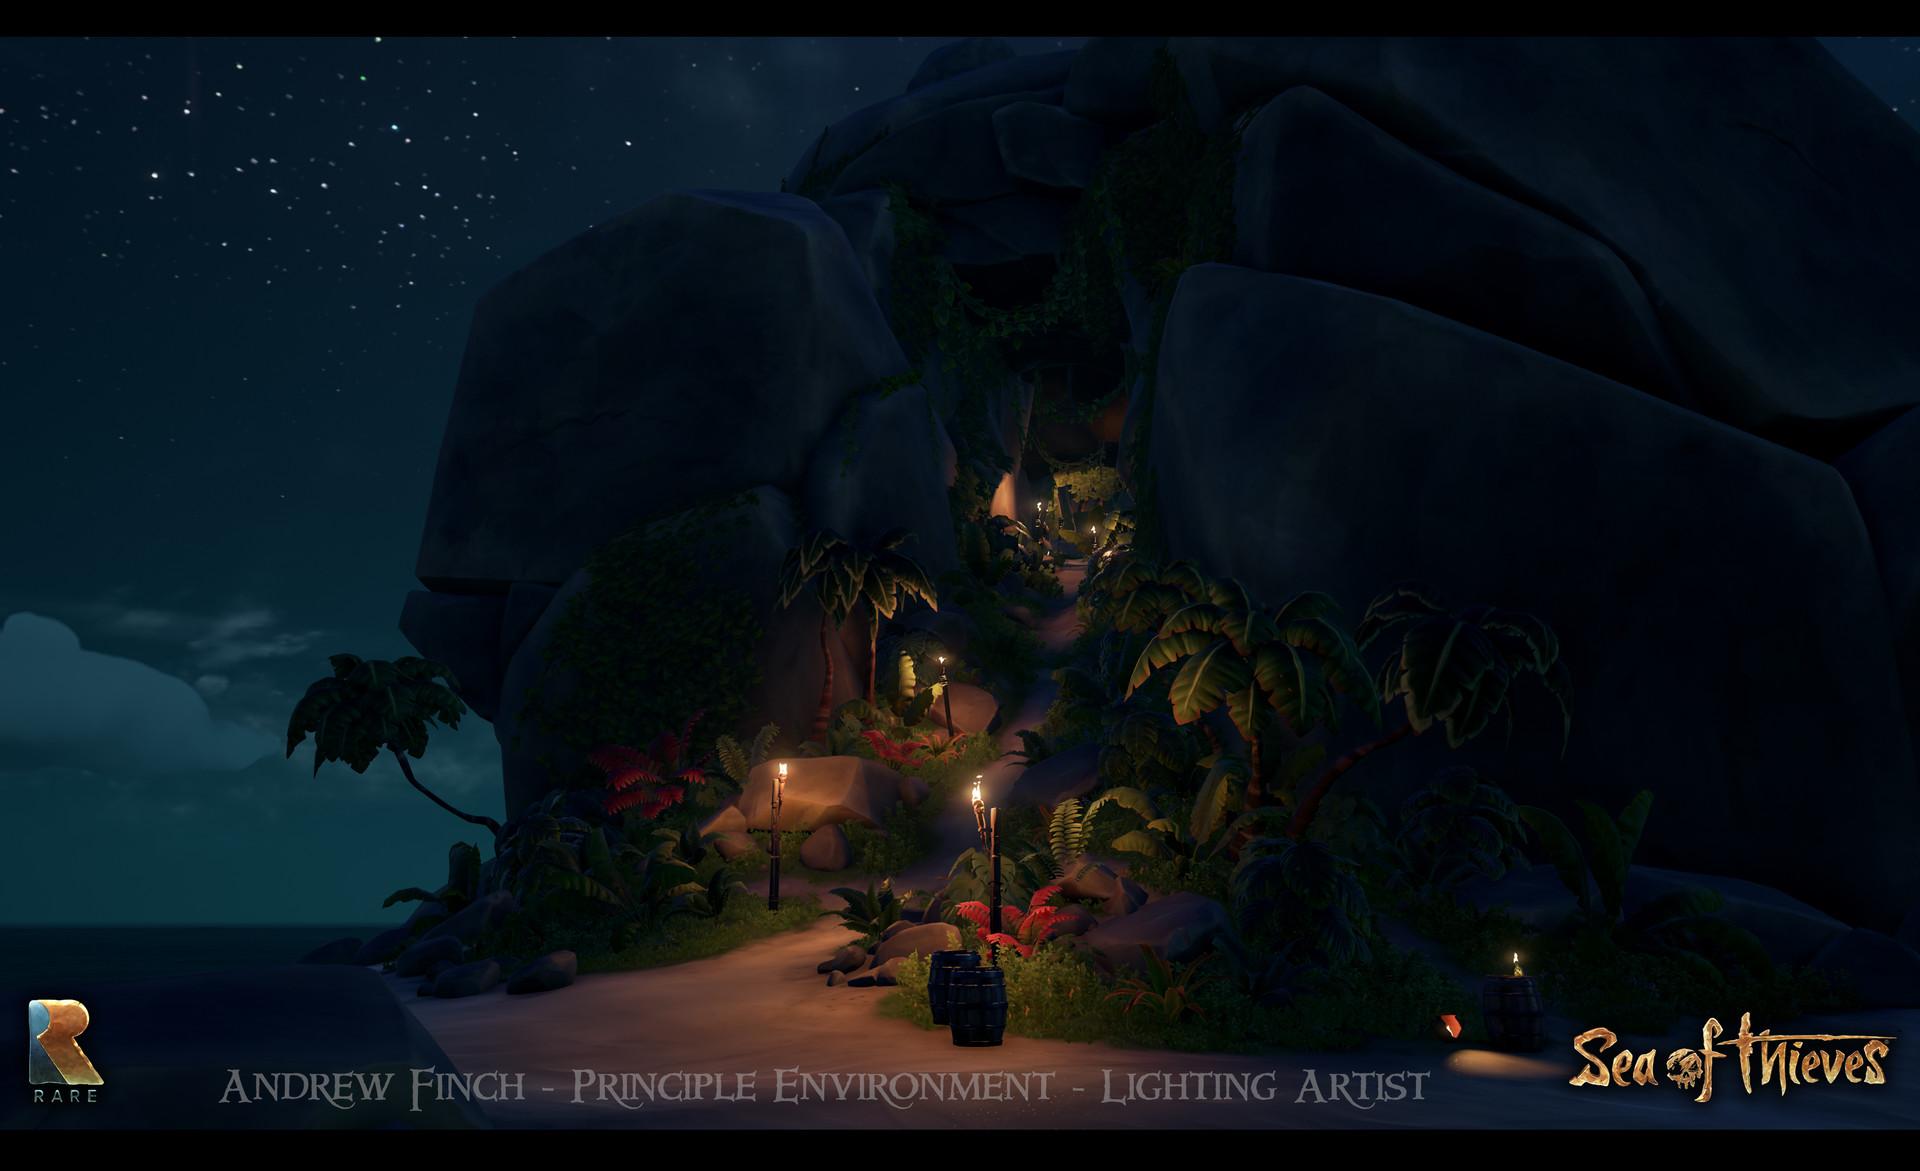 Andrew finch island lighting 26